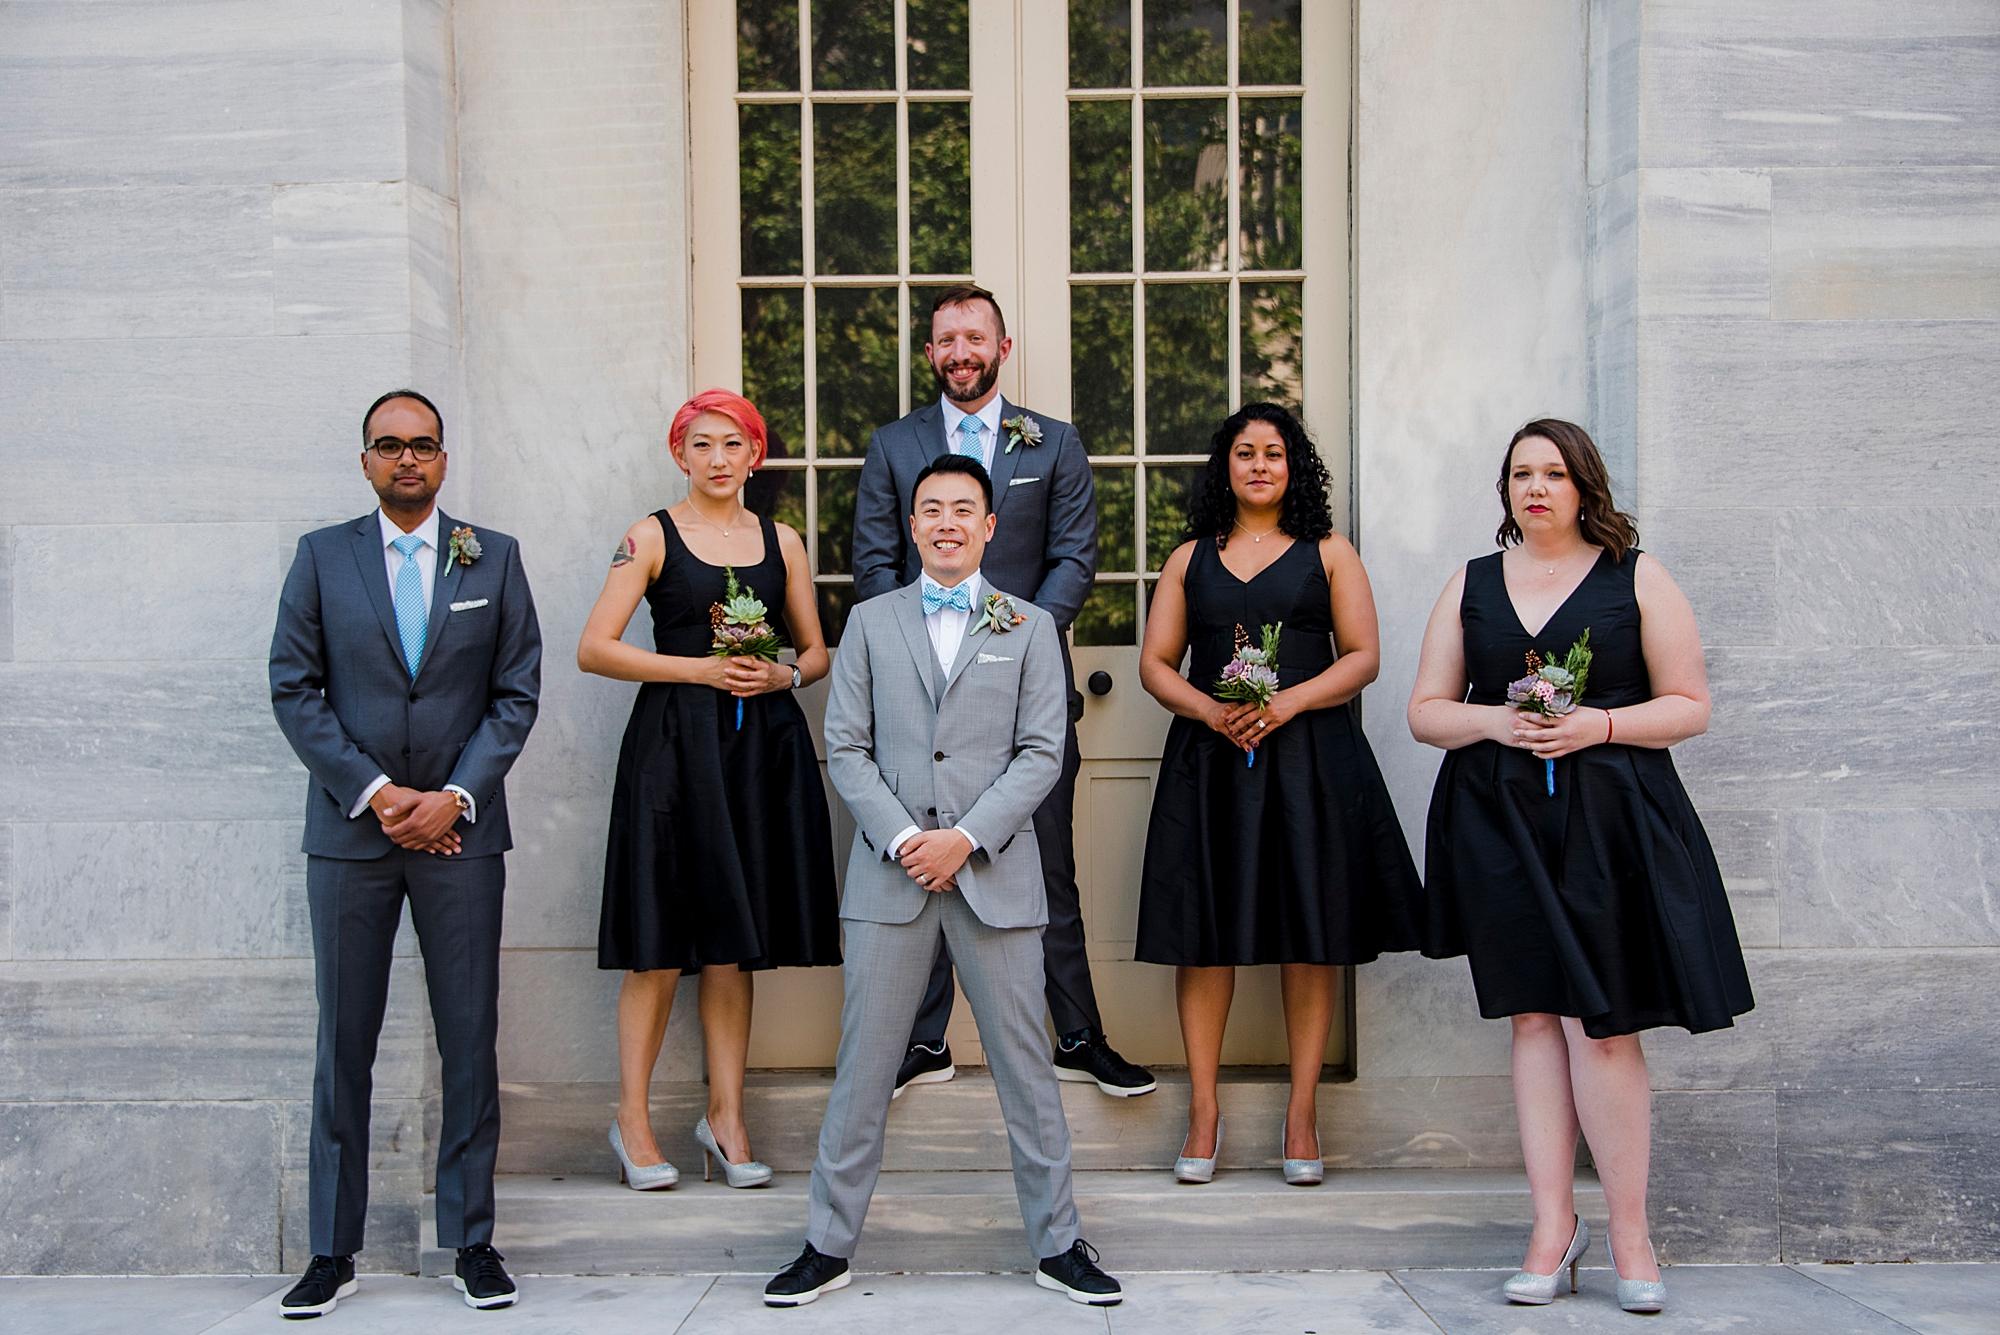 Dan_and_Byron_Love_by_Joe_Mac_Philadelphia_Wedding_LGBTQ_Photography_Gay_Independence_visitor_Center_67.JPG